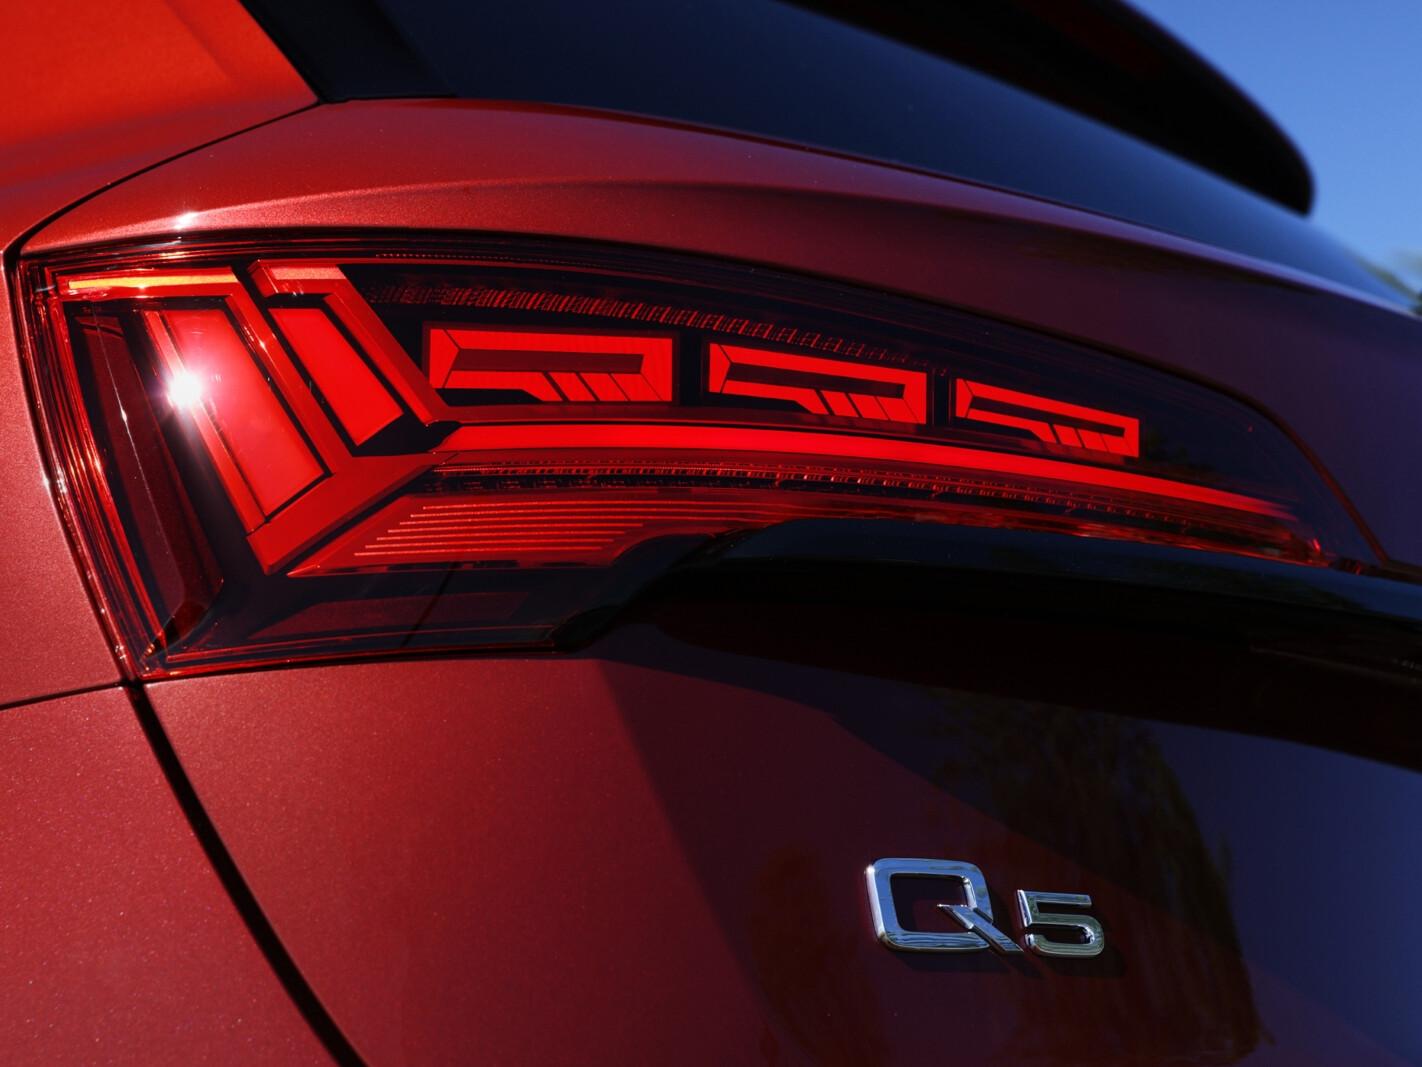 2021 Audi Q5 40 TDI Launch Edition